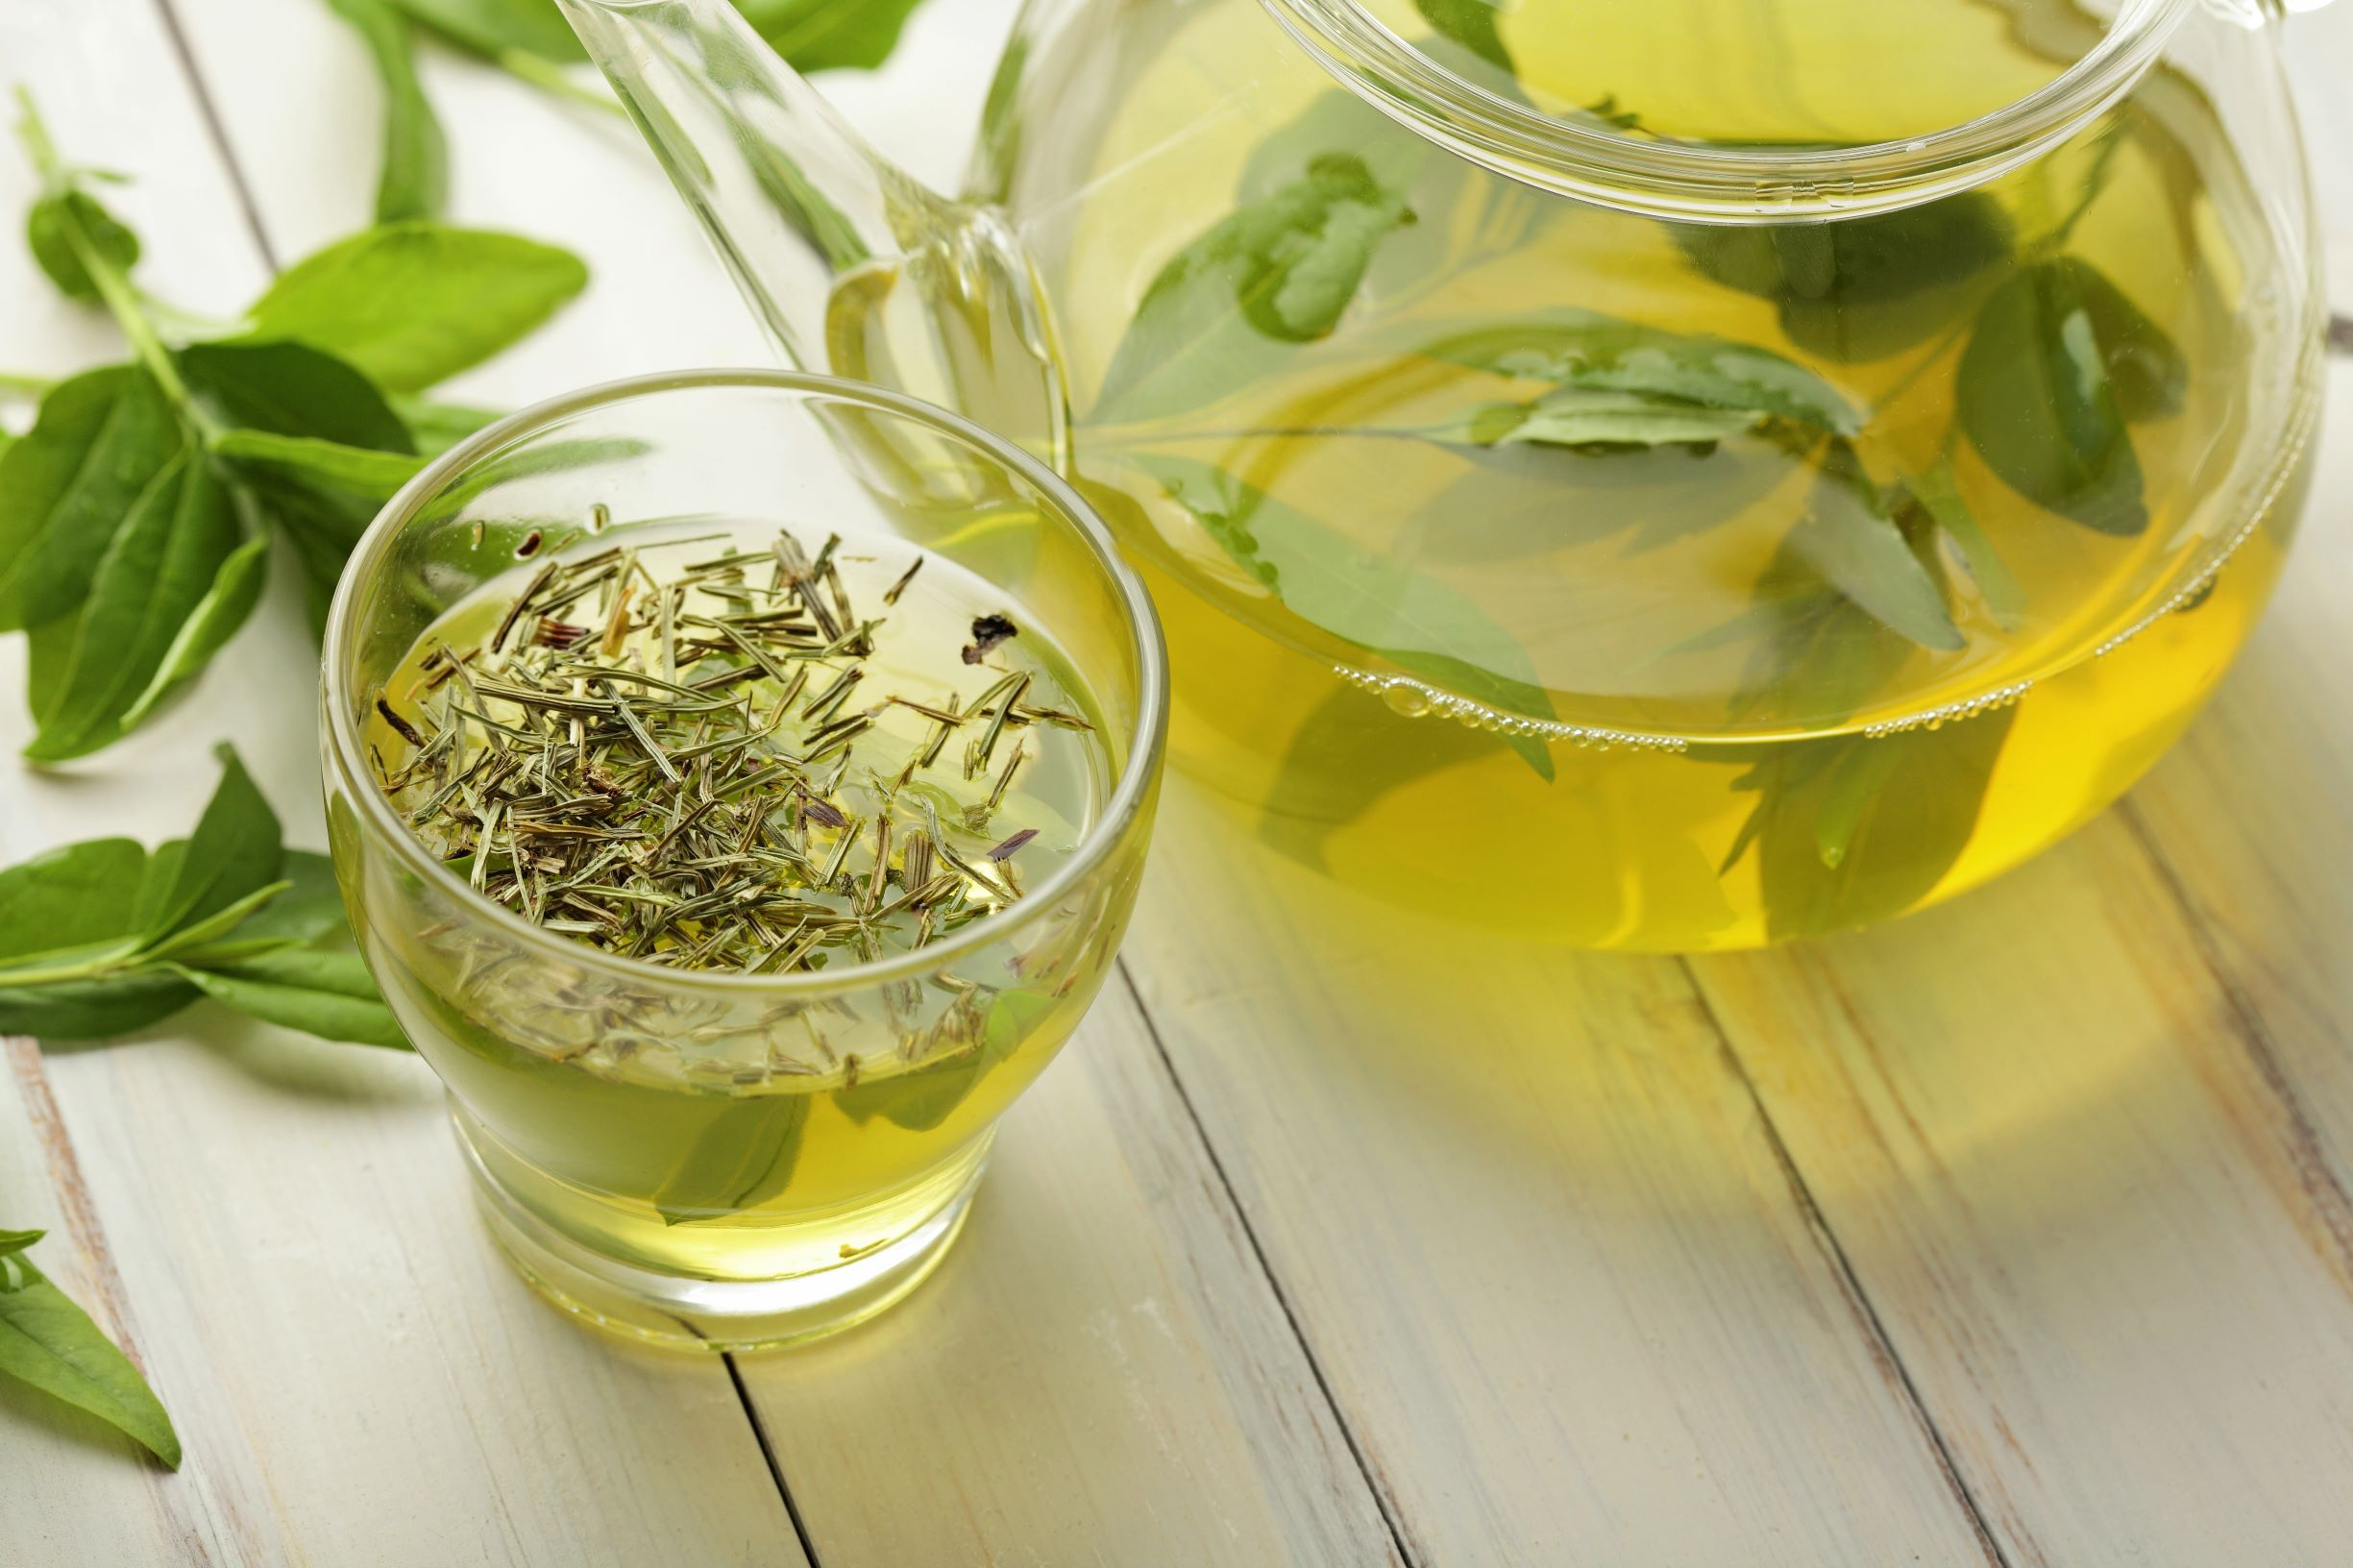 Thé vert : à consommer avec mo-de-ra-tion !